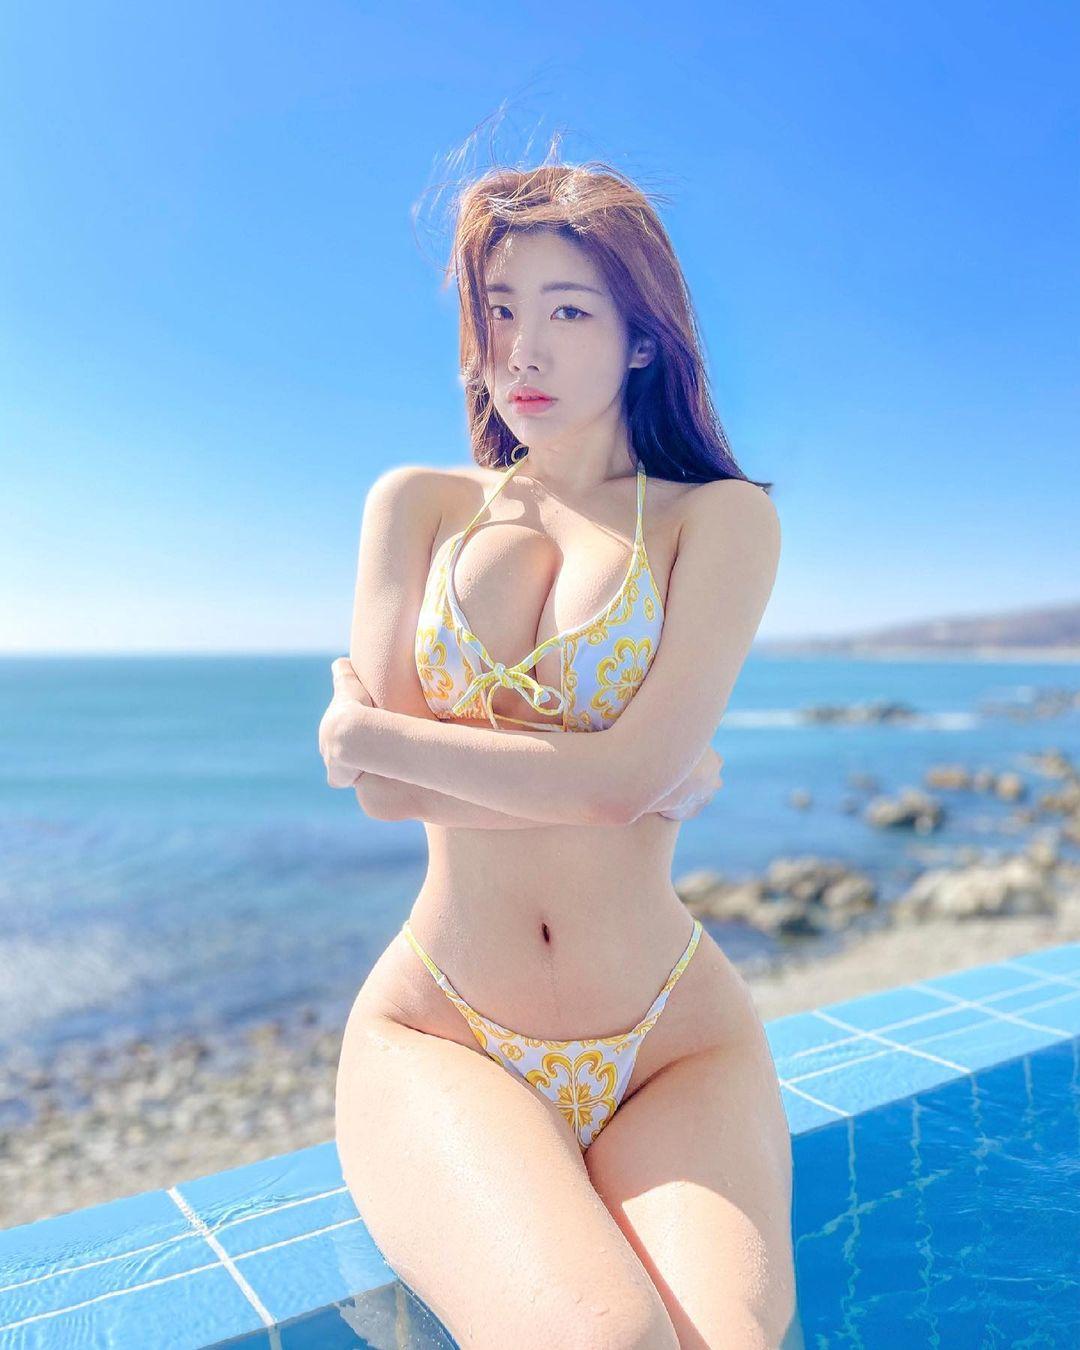 Featured image for Instagram Star Jeon Yebin [전예빈] Shows Off New  Bikini In Instagram Post